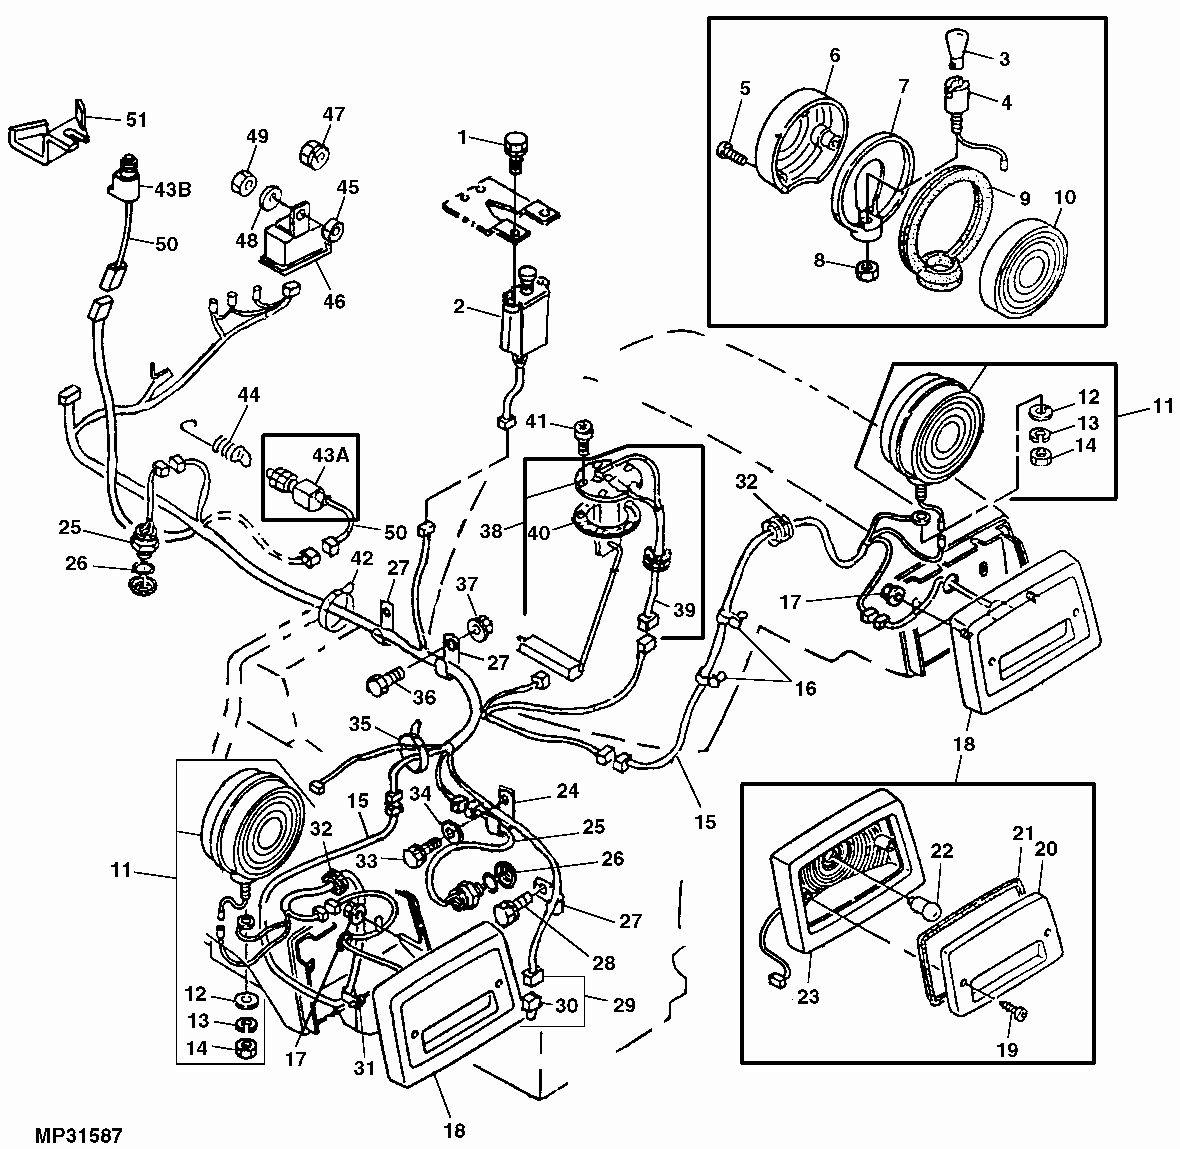 John Deere Wiring Diagram Download